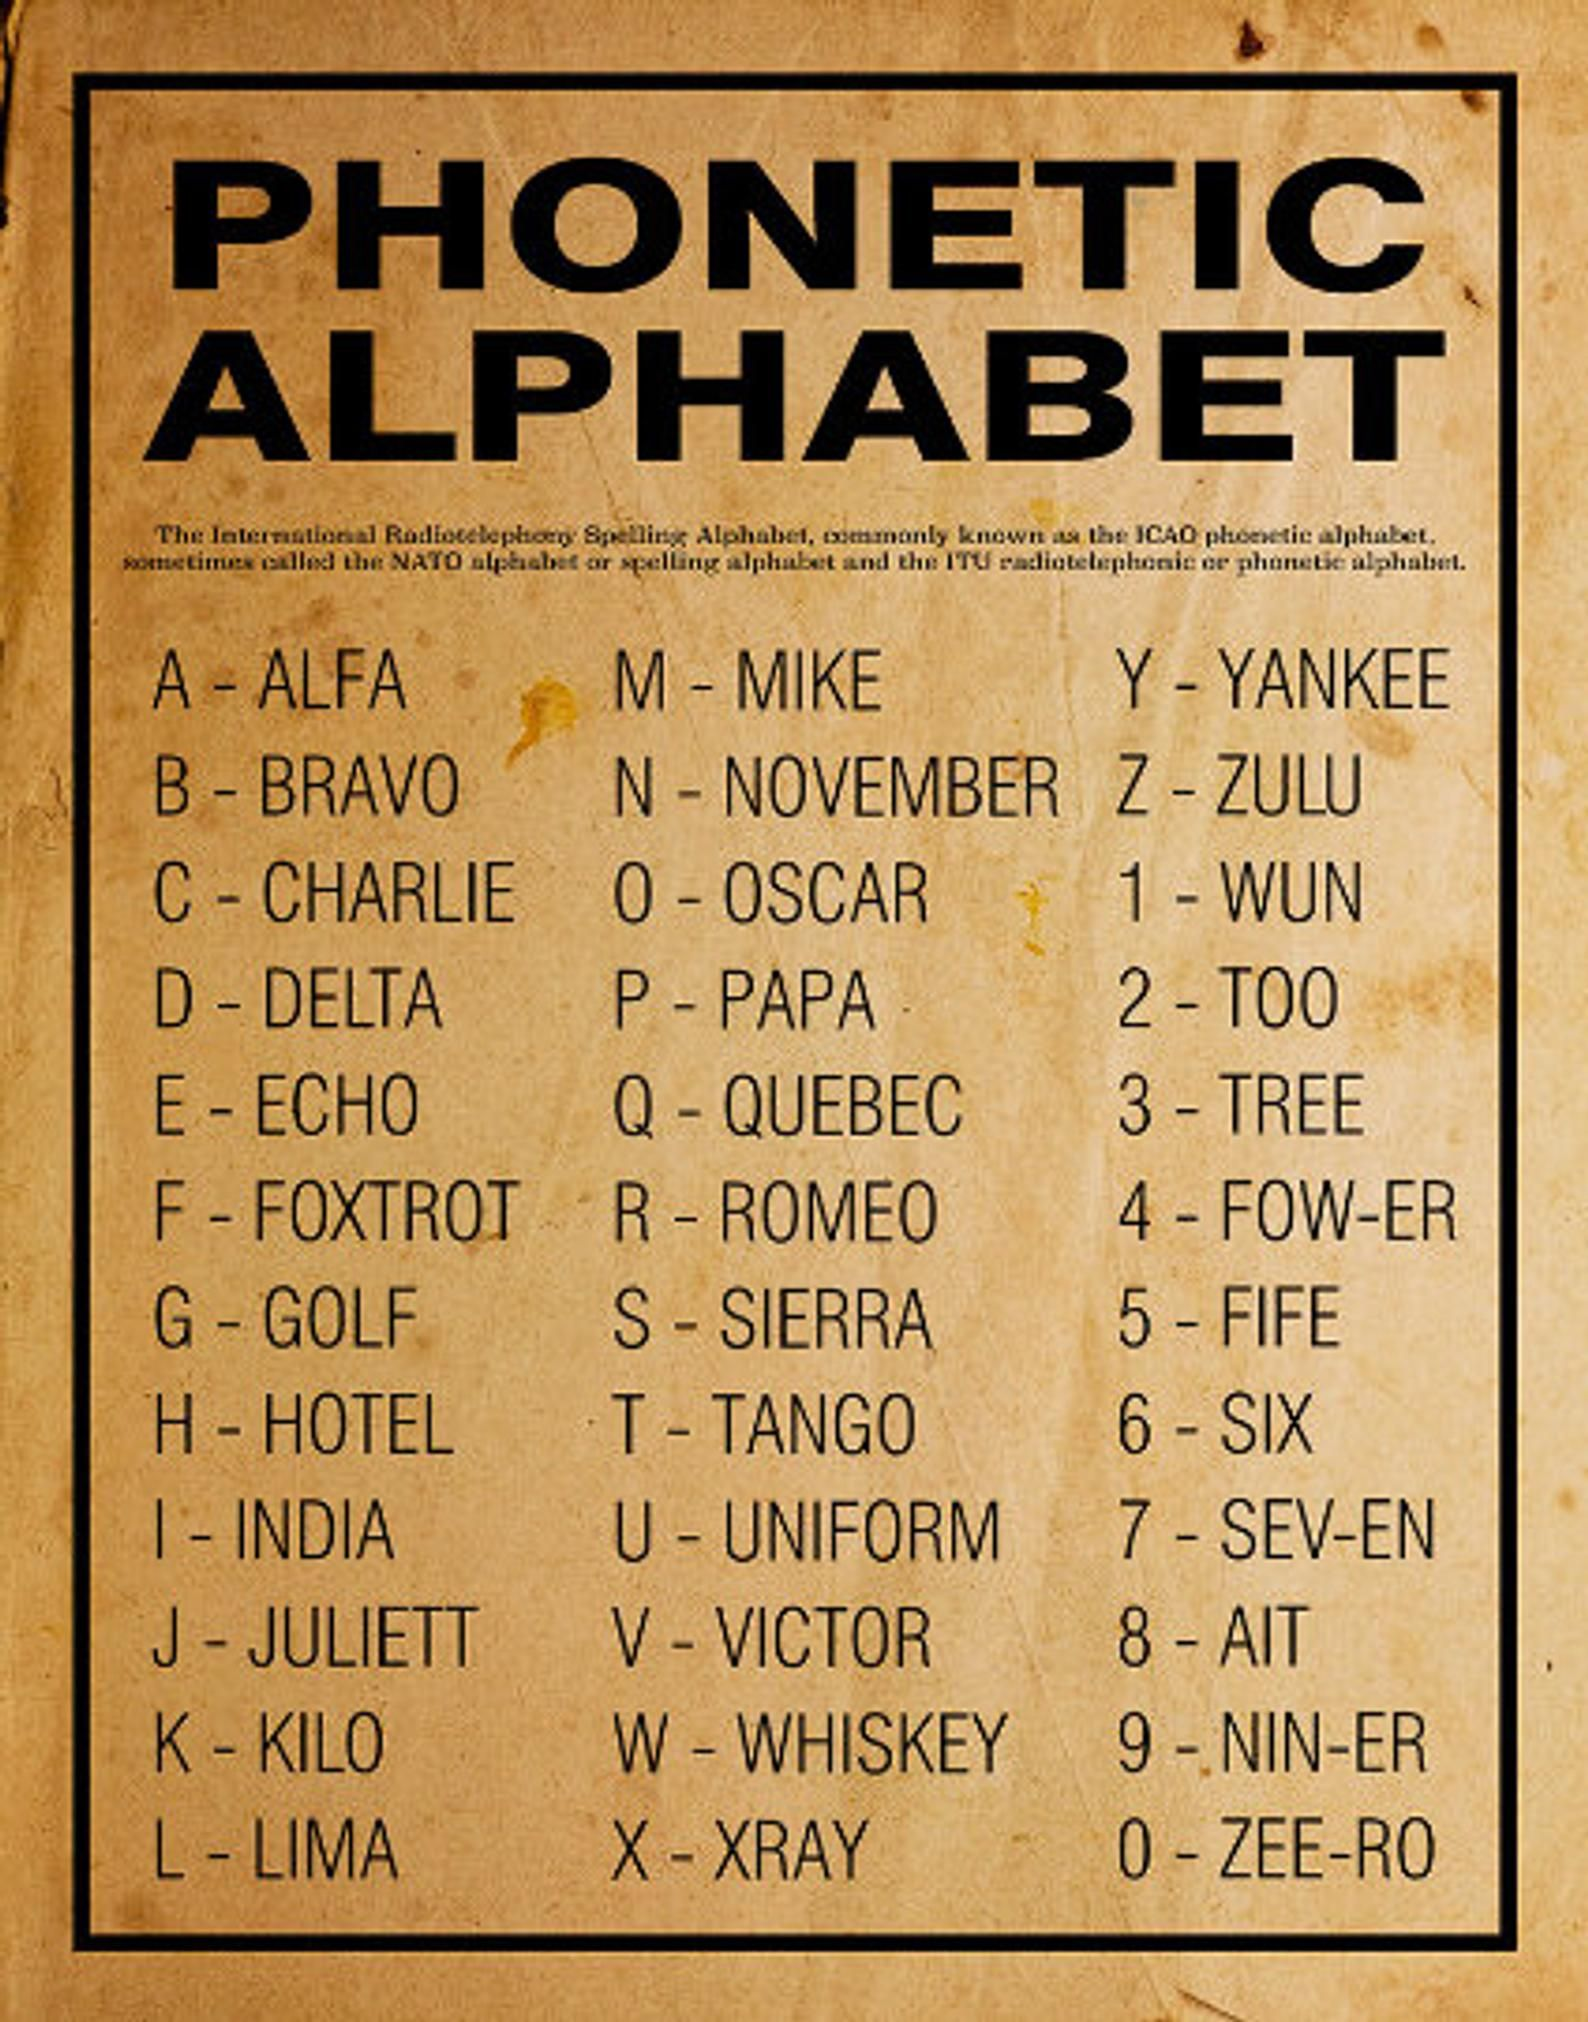 Printable Phonetic Alphabet Etsy In 2020 Phonetic Alphabet Alphabet Poster Alphabet Code